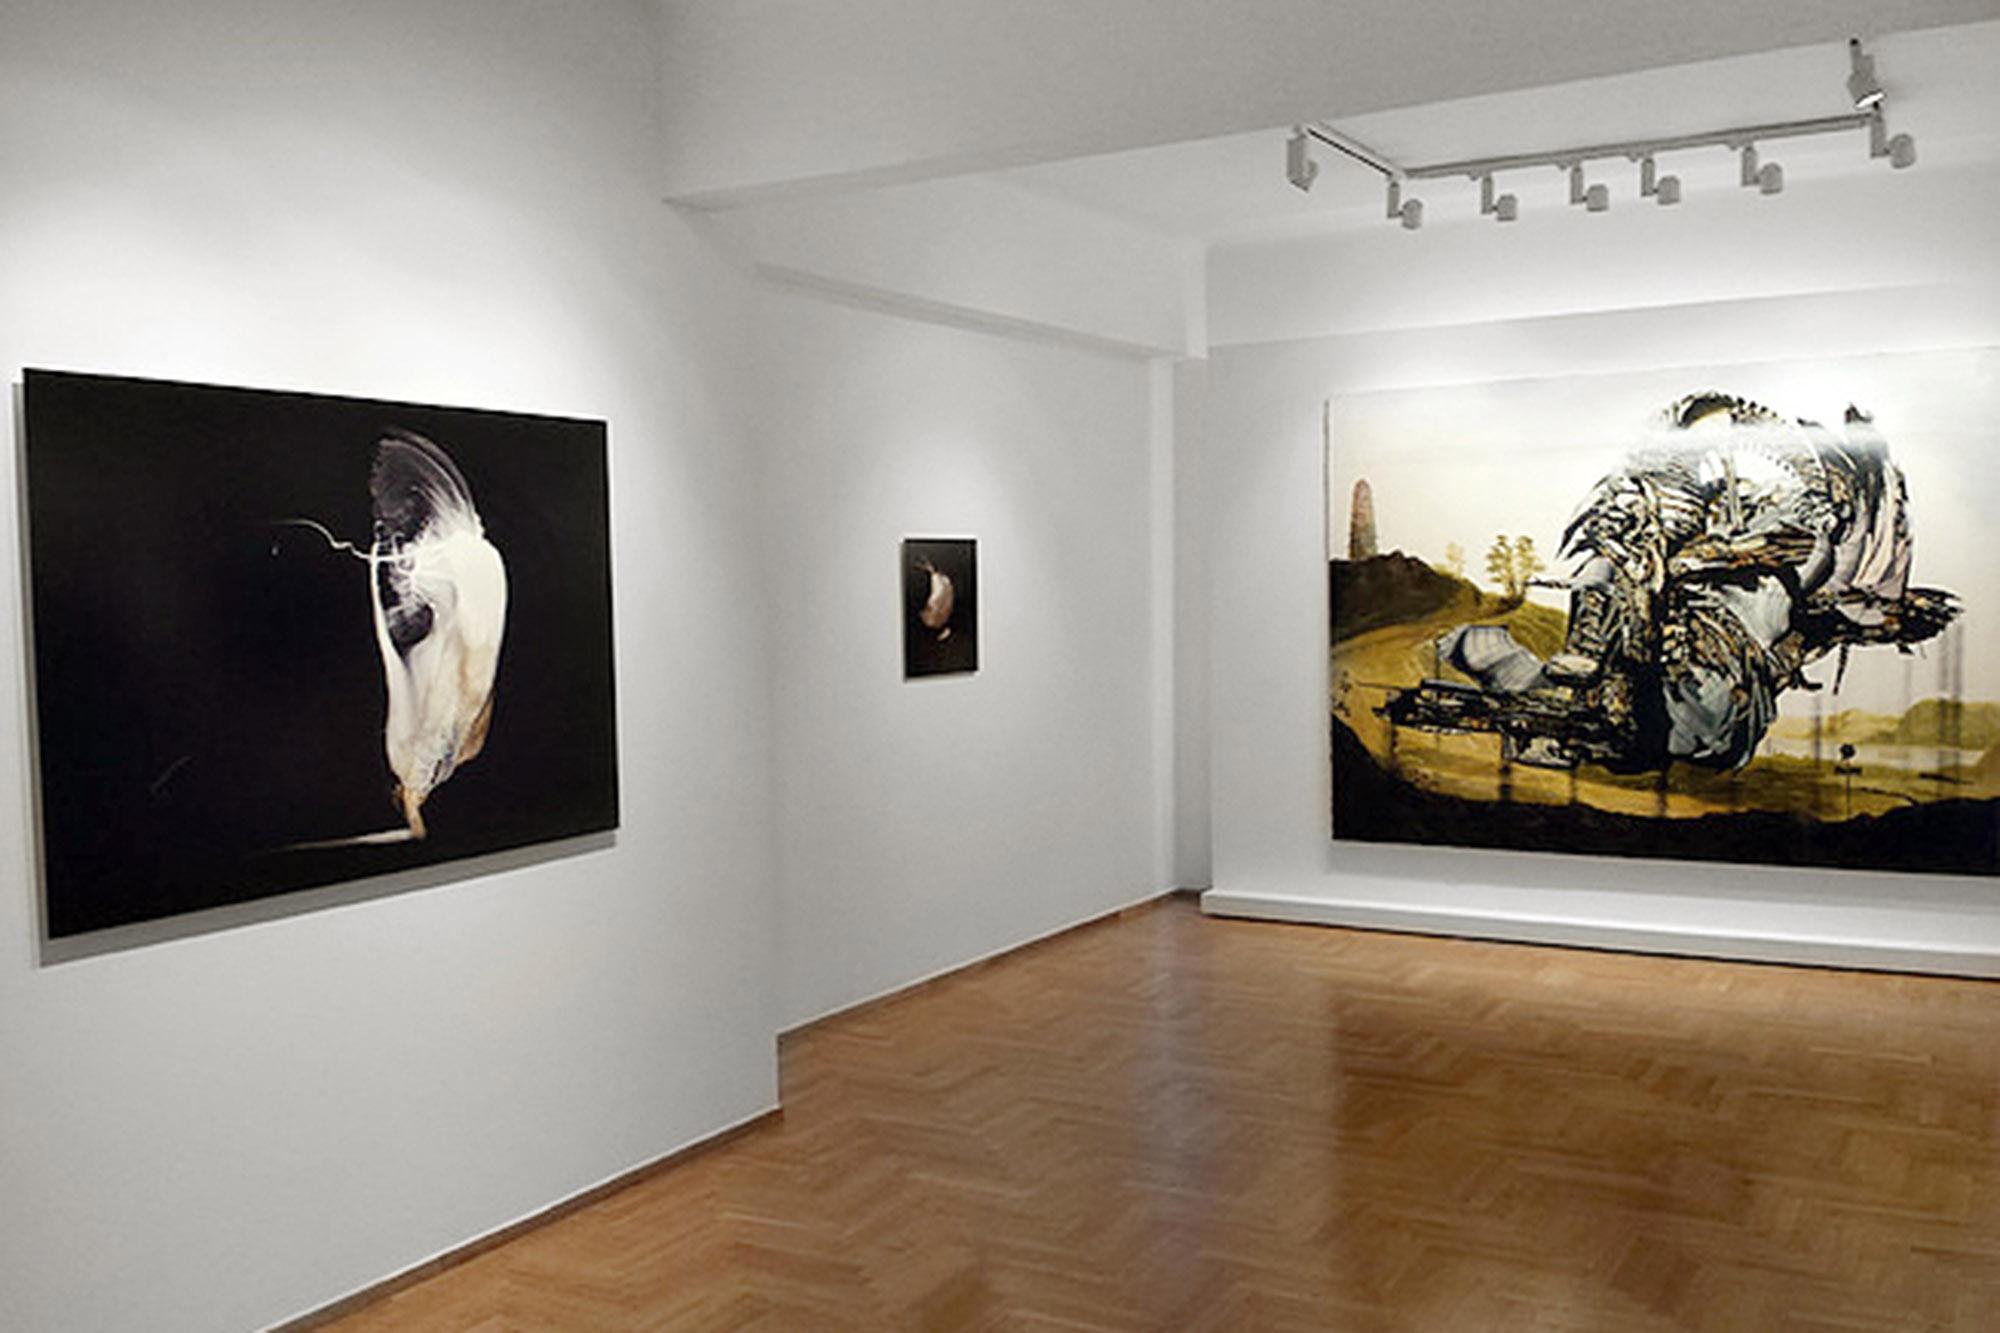 Chris Hawtin & Filippos Tsitsopoulos - Image 2